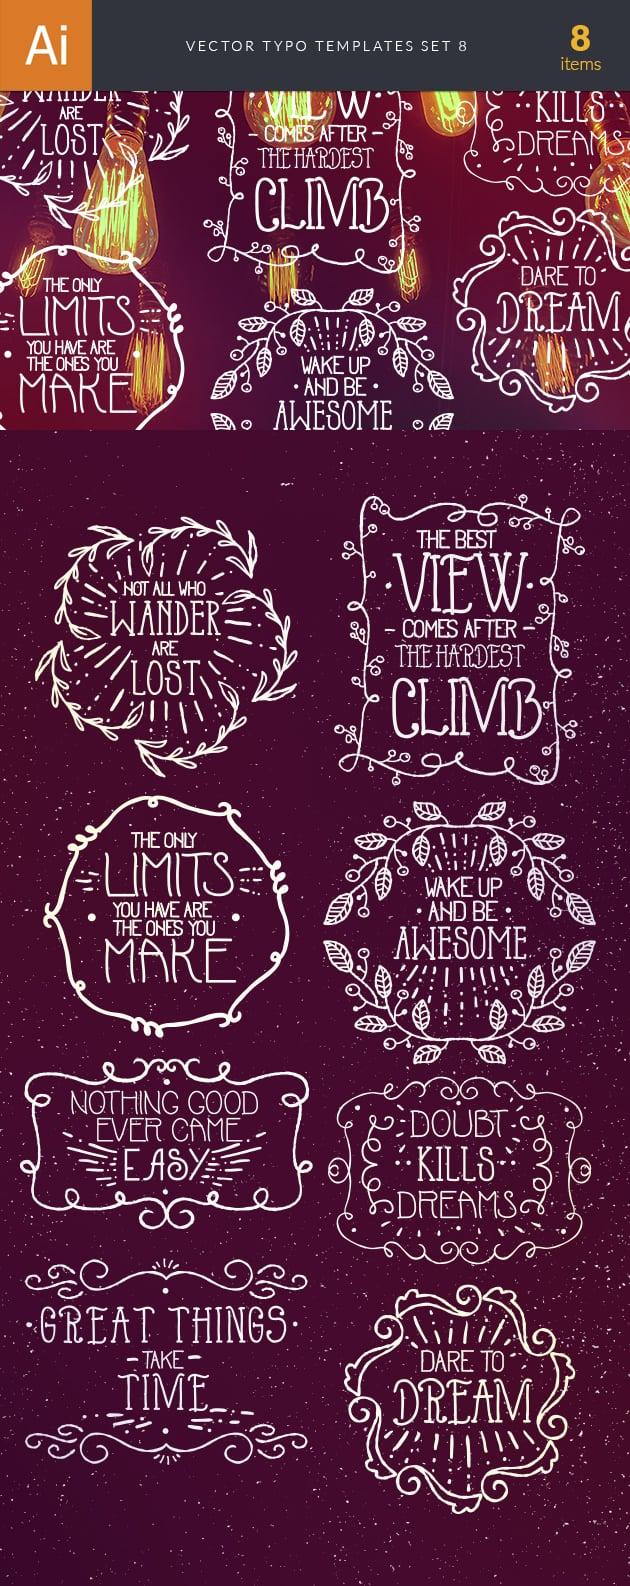 Vector Typography Templates Set 8 2